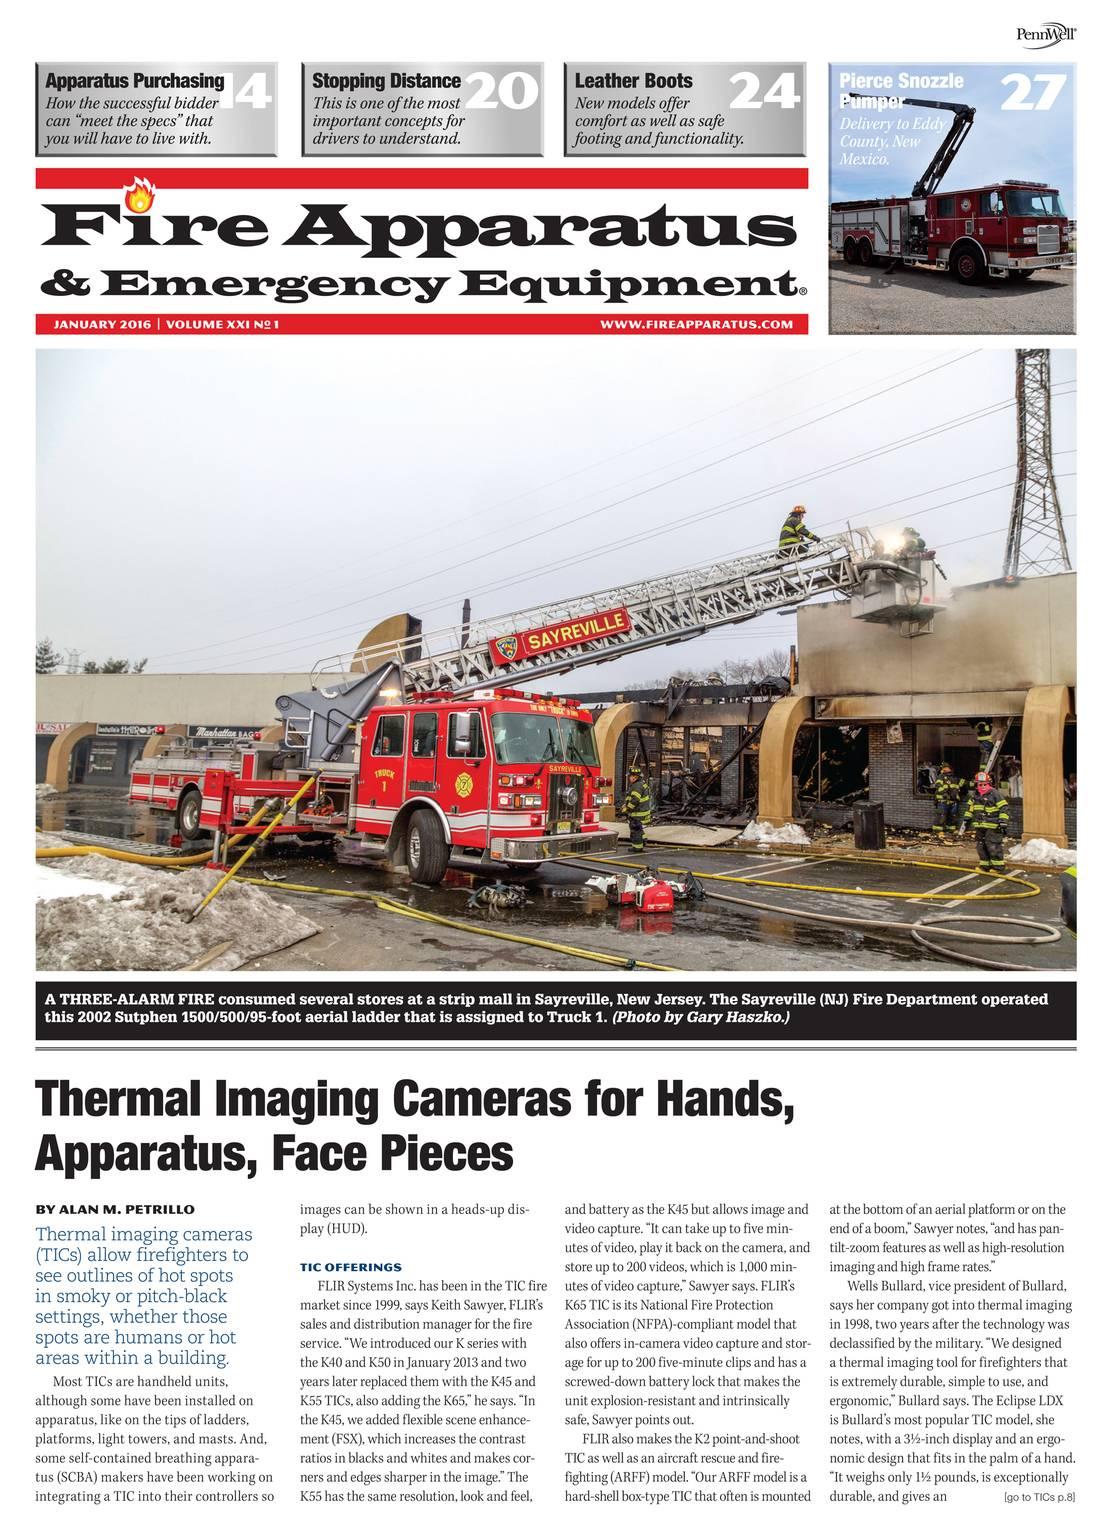 Fire Apparatus Magazine - January 2016 - page 2